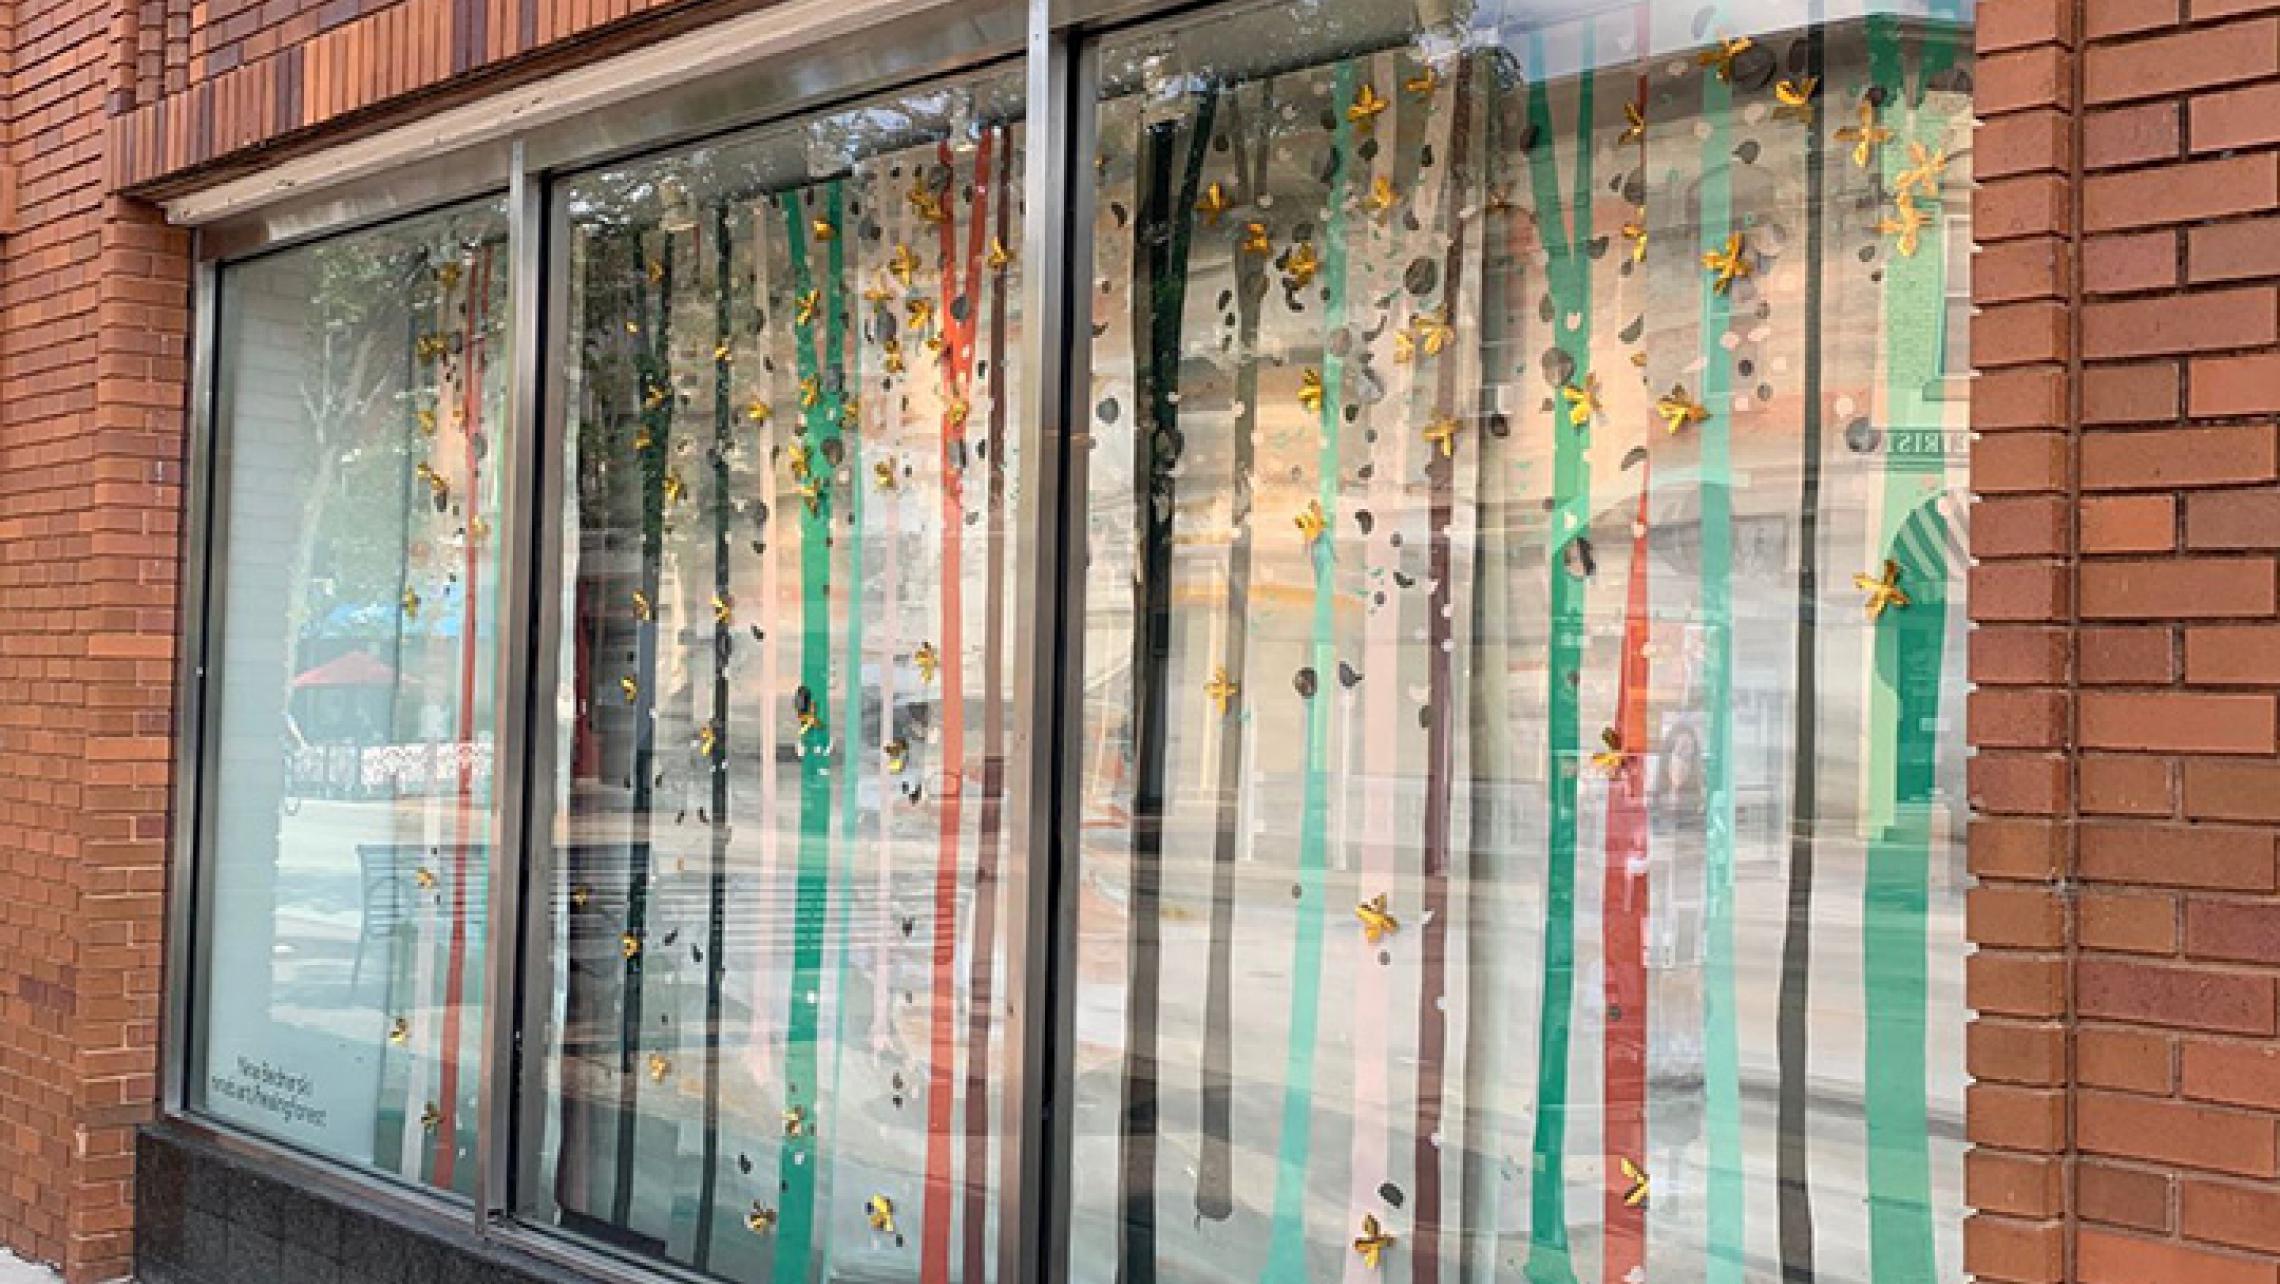 Art installation by Nina Bednarski at ULI's commercial property at 341 State Street